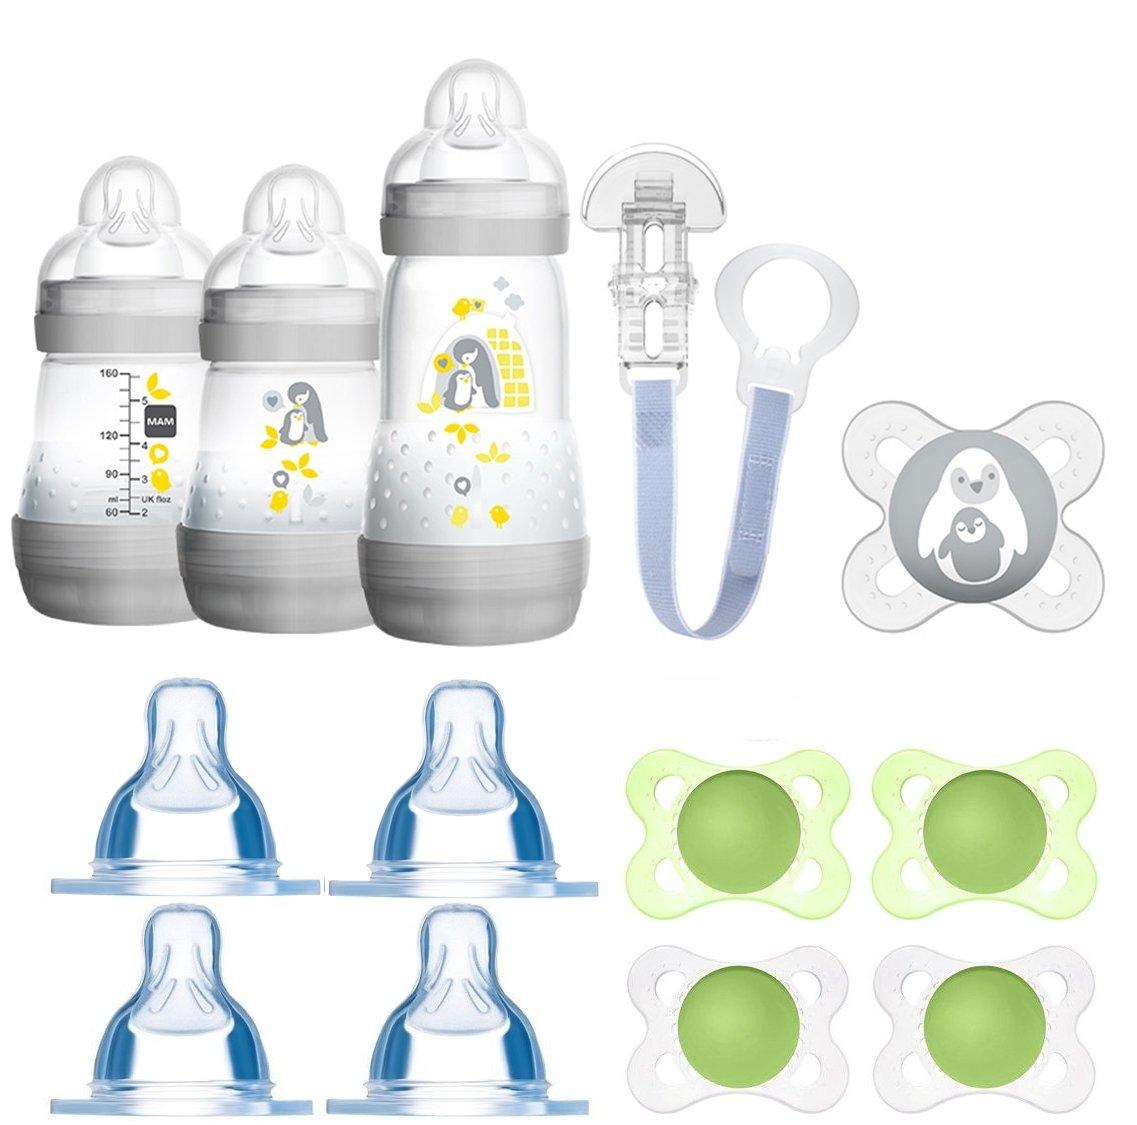 Mam Juego 2 - START botellas de - Aspiradora Chupete 24 ...